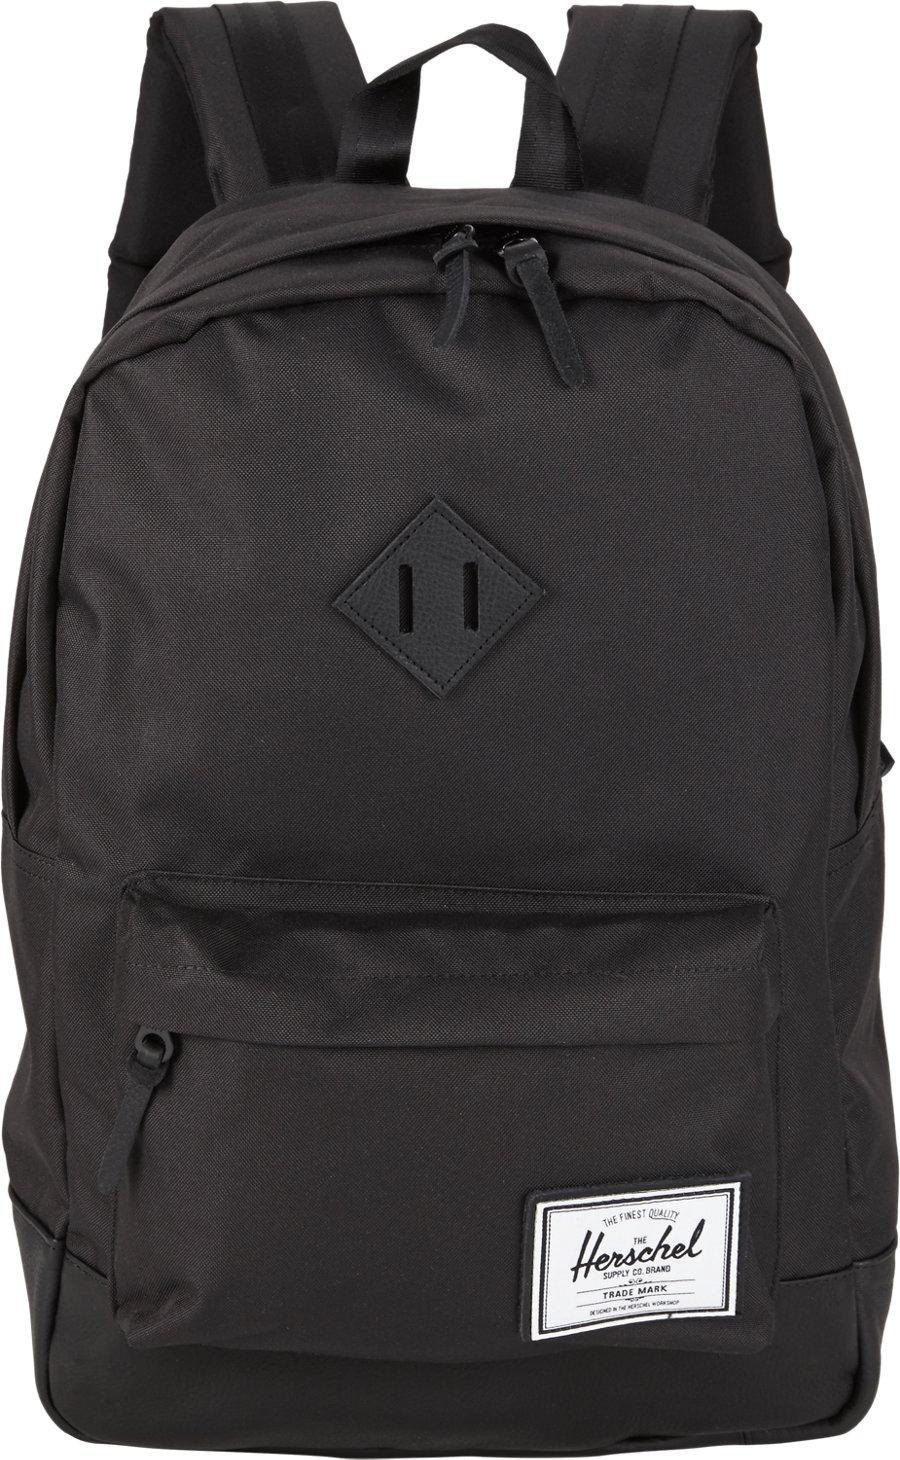 Lyst Herschel Supply Co Heritage Backpack In Black